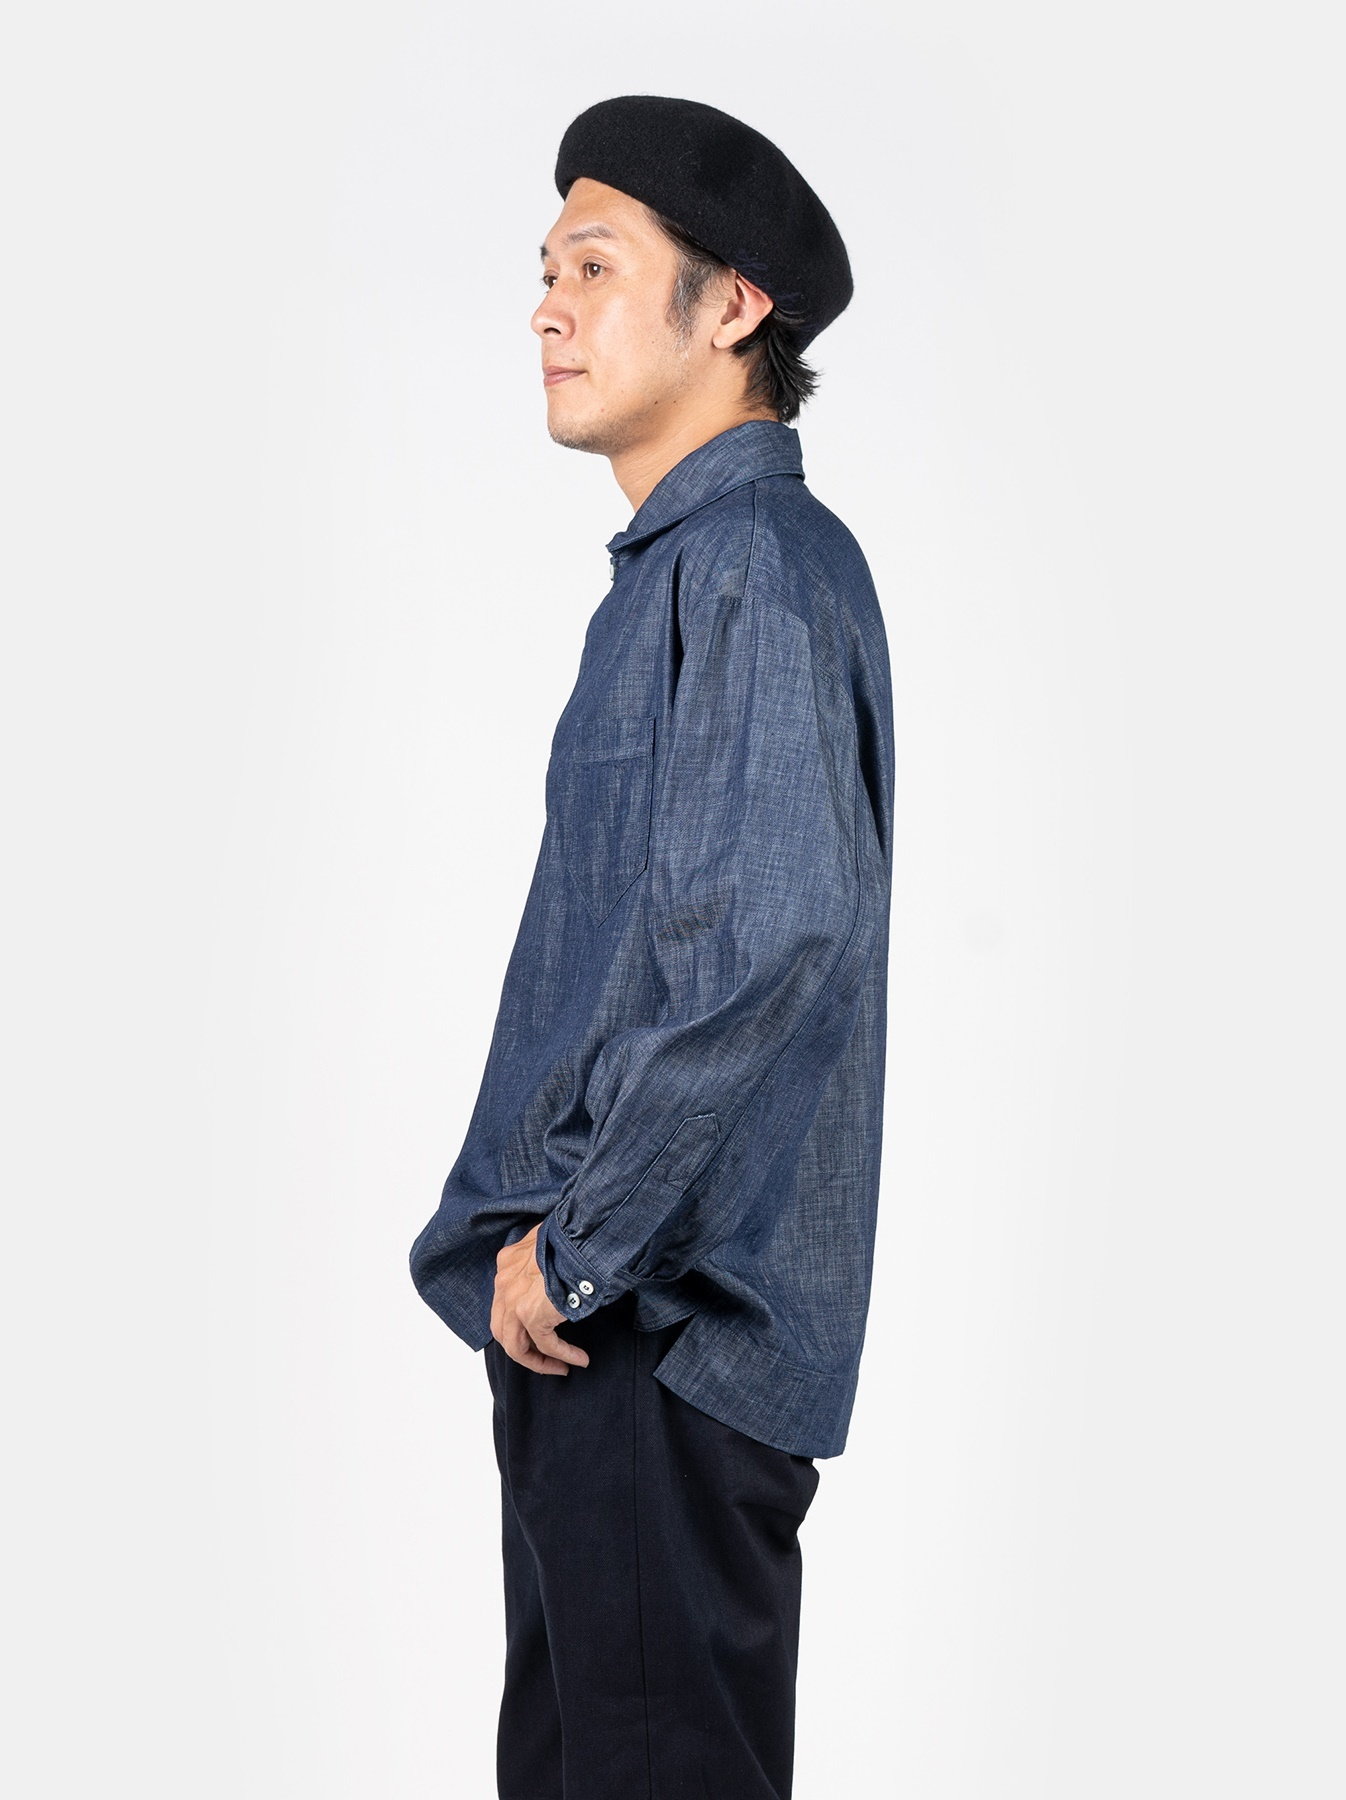 WH Goma Denim Umahiko Pullover Shirt-4